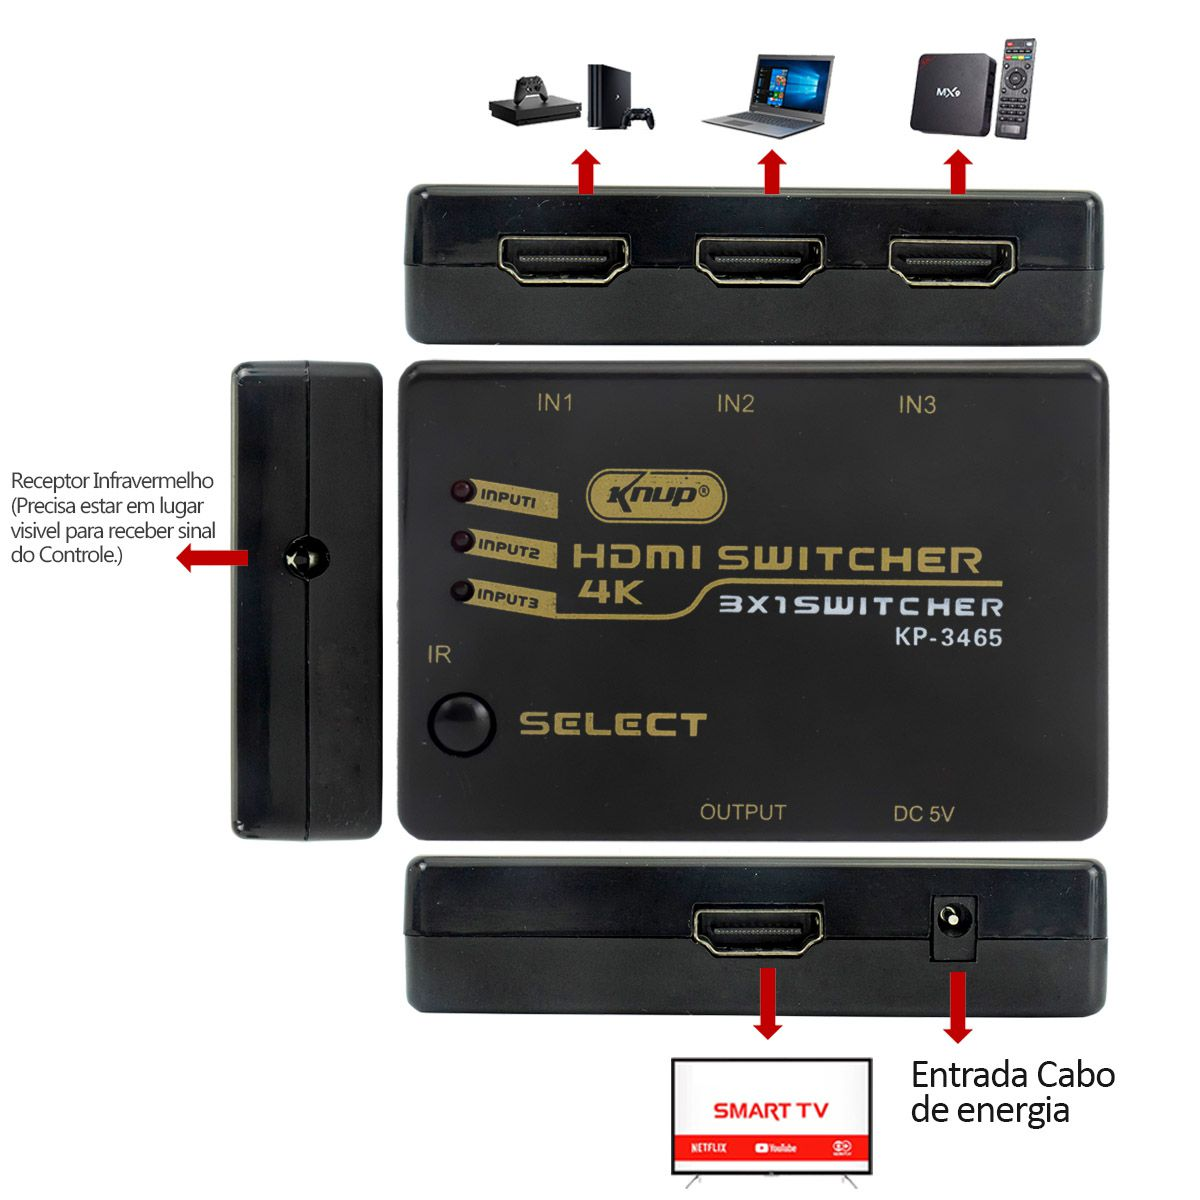 Switch HDMI 4k 3x1 com Controle Knup KP-3465 + Cabo Usb DC + 4 Cabos hdmi de 1,5 Metro